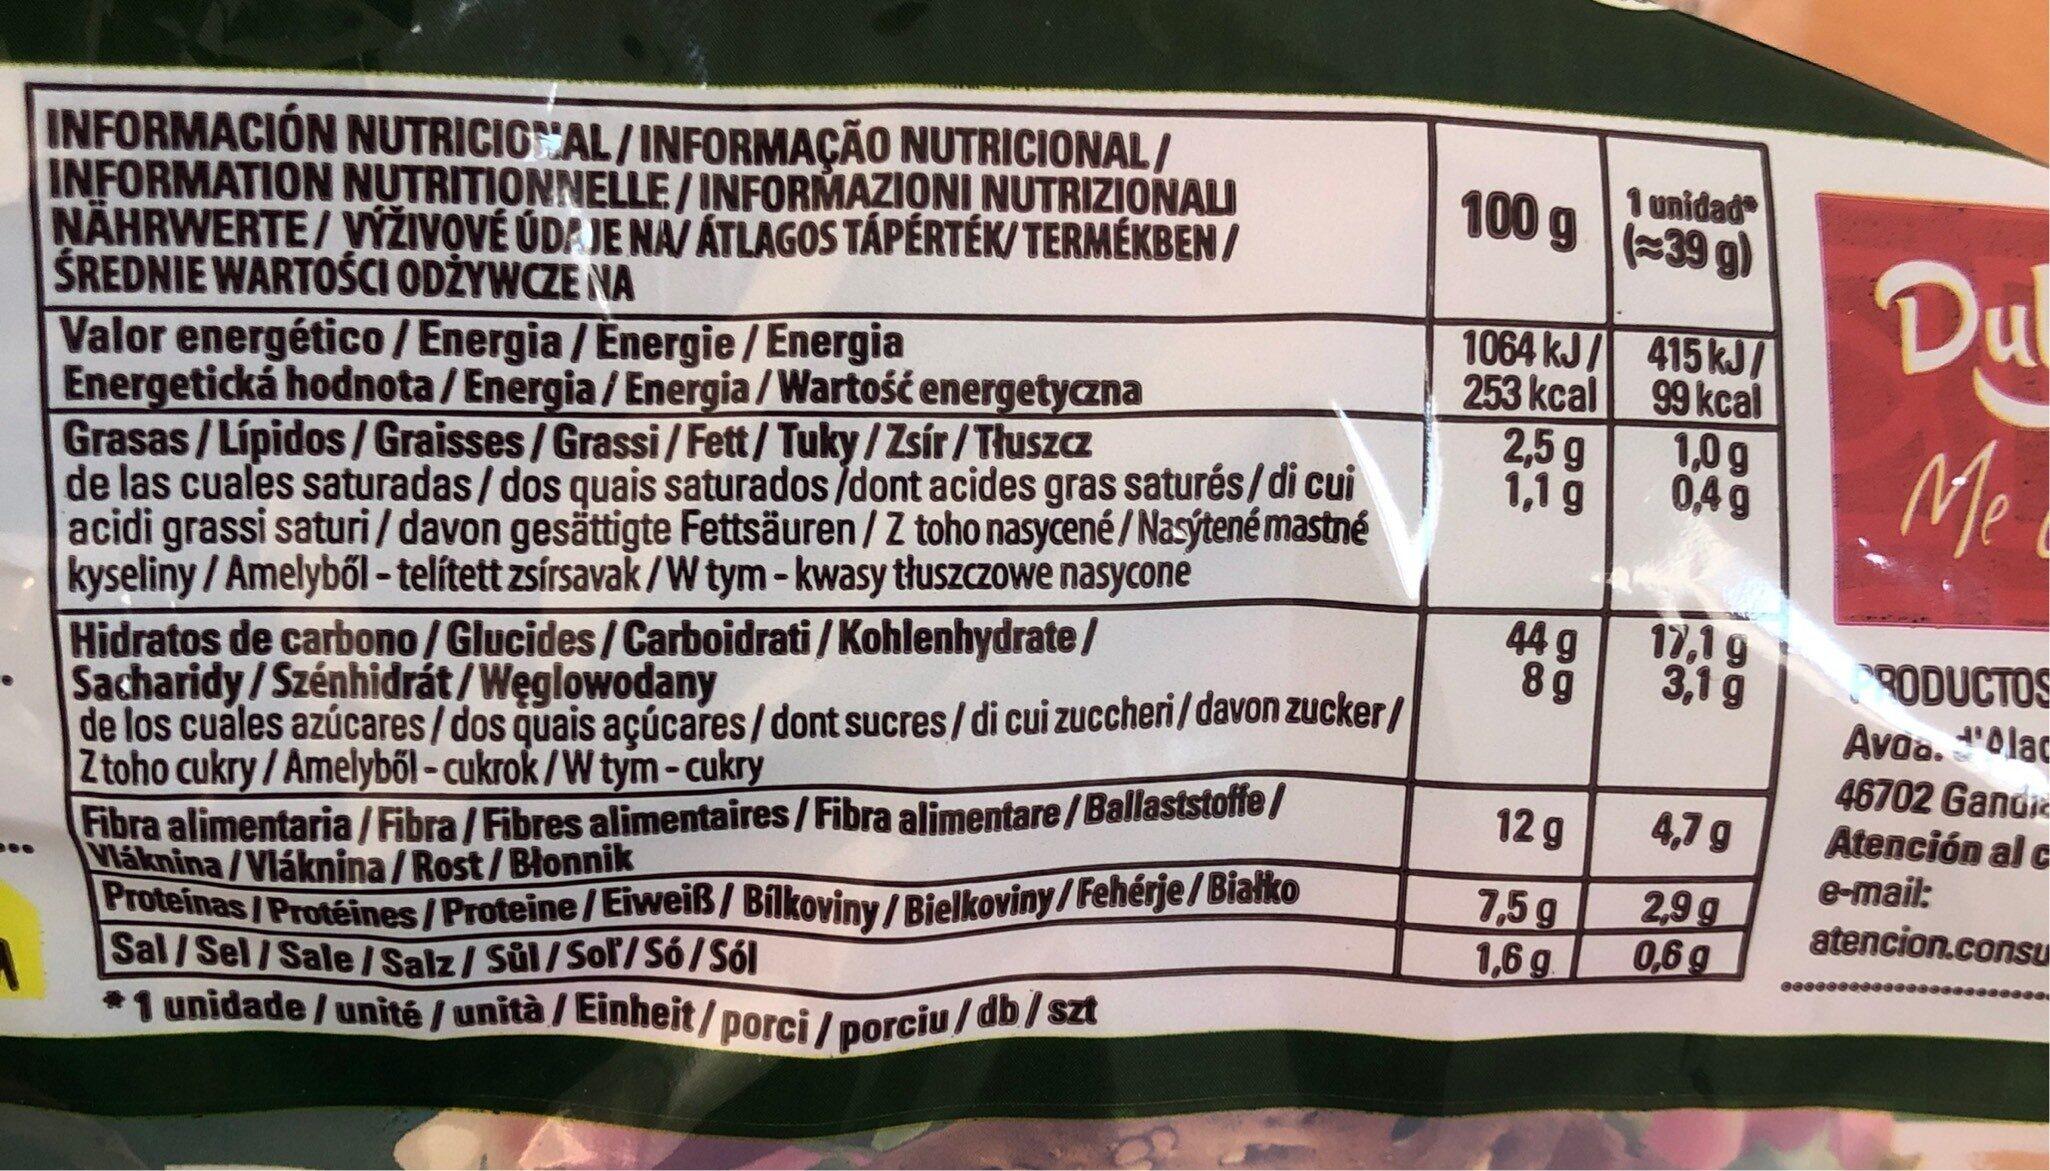 Pan sottile cereales y semillas - Informations nutritionnelles - fr